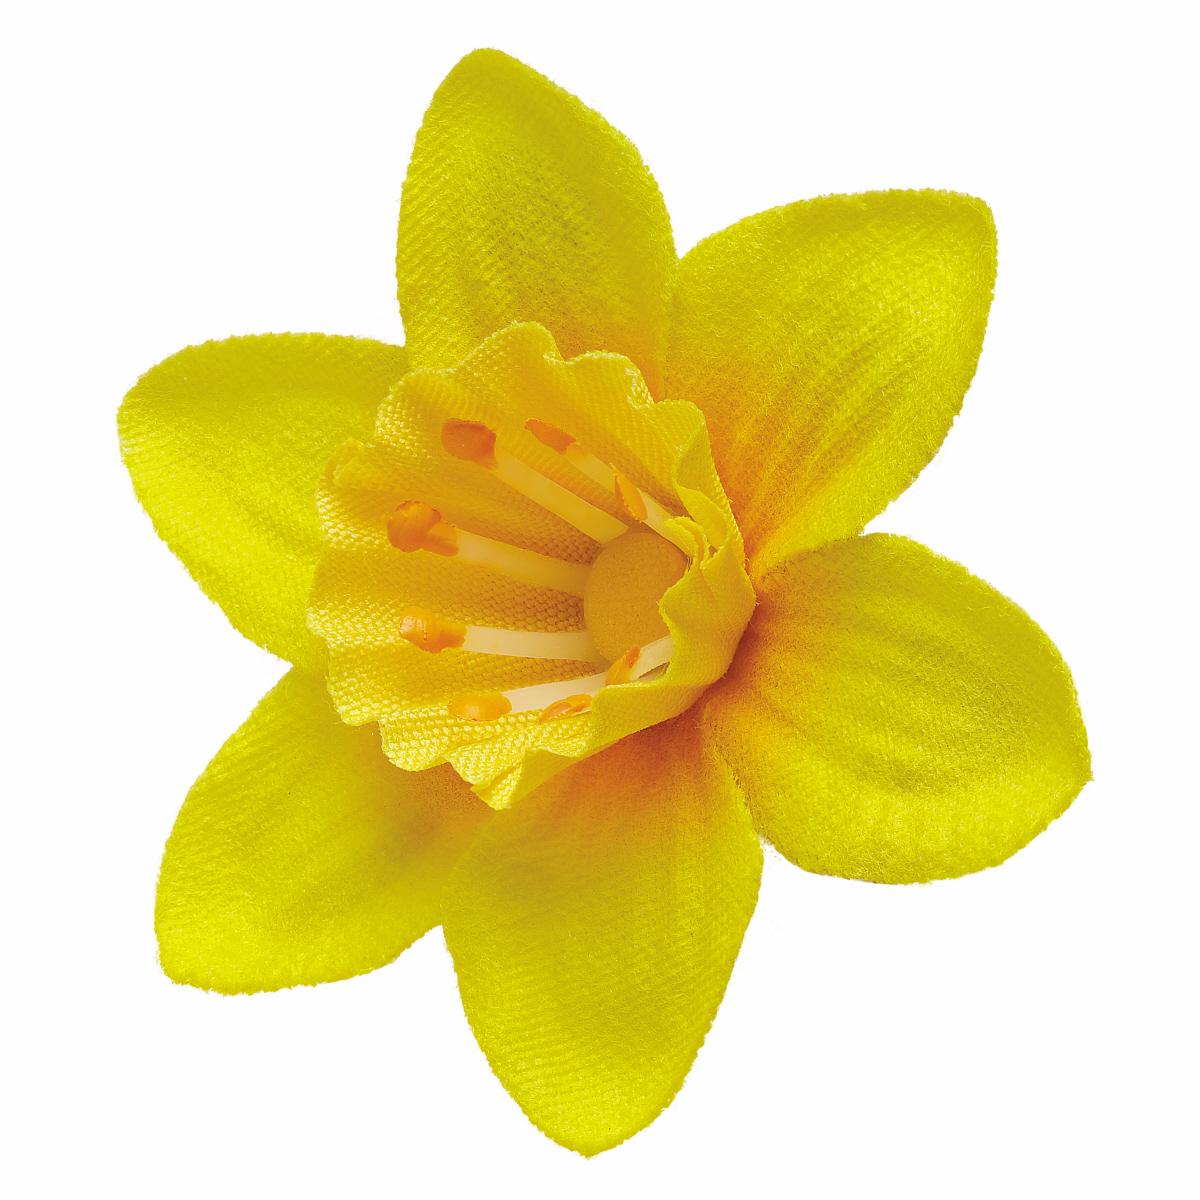 free daffodil  download free clip art  free clip art on free cheer clip art free cheer clip art